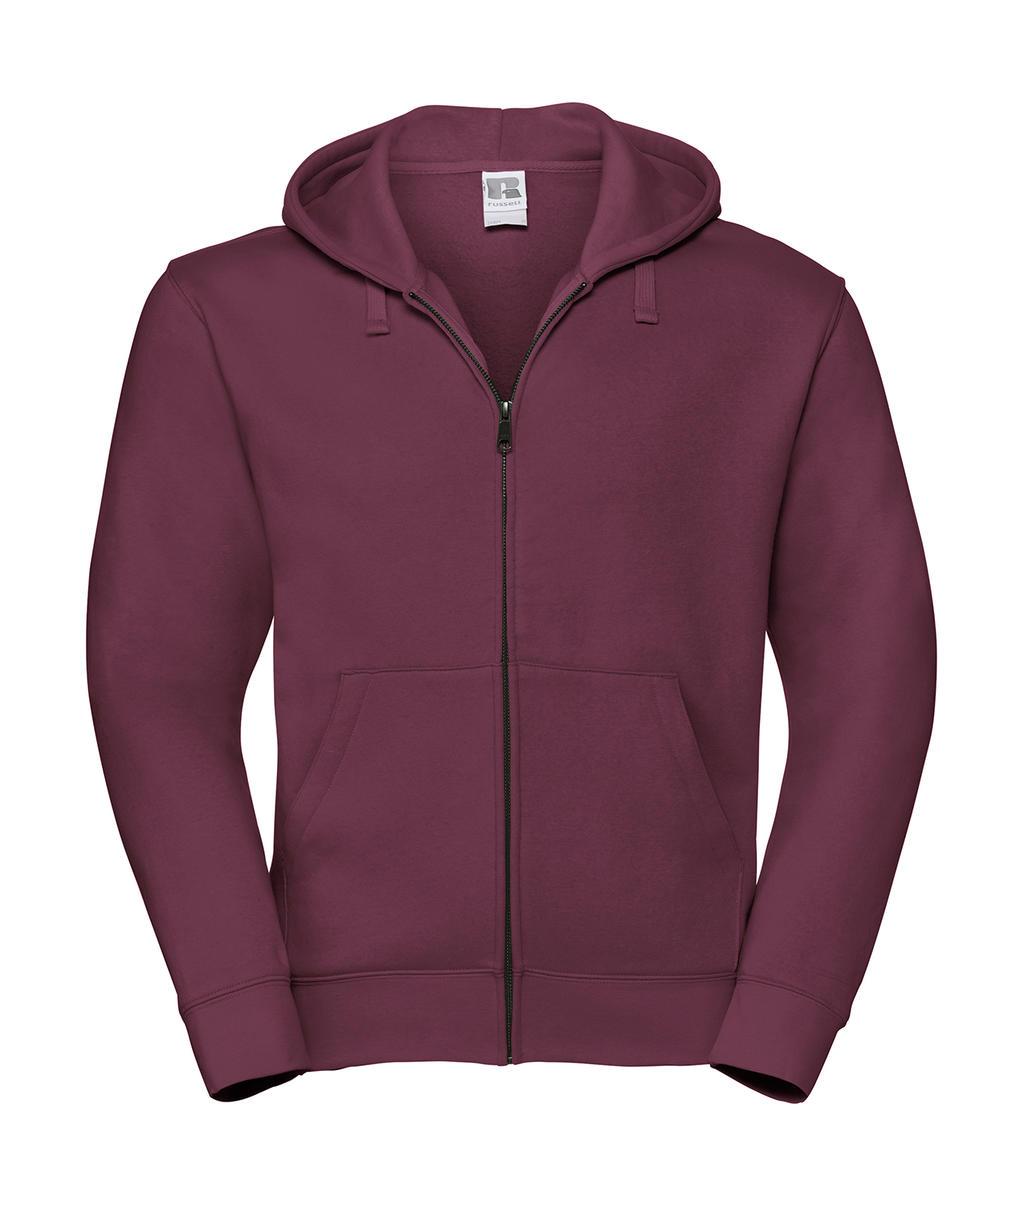 Men's Authentic Zipped Hood